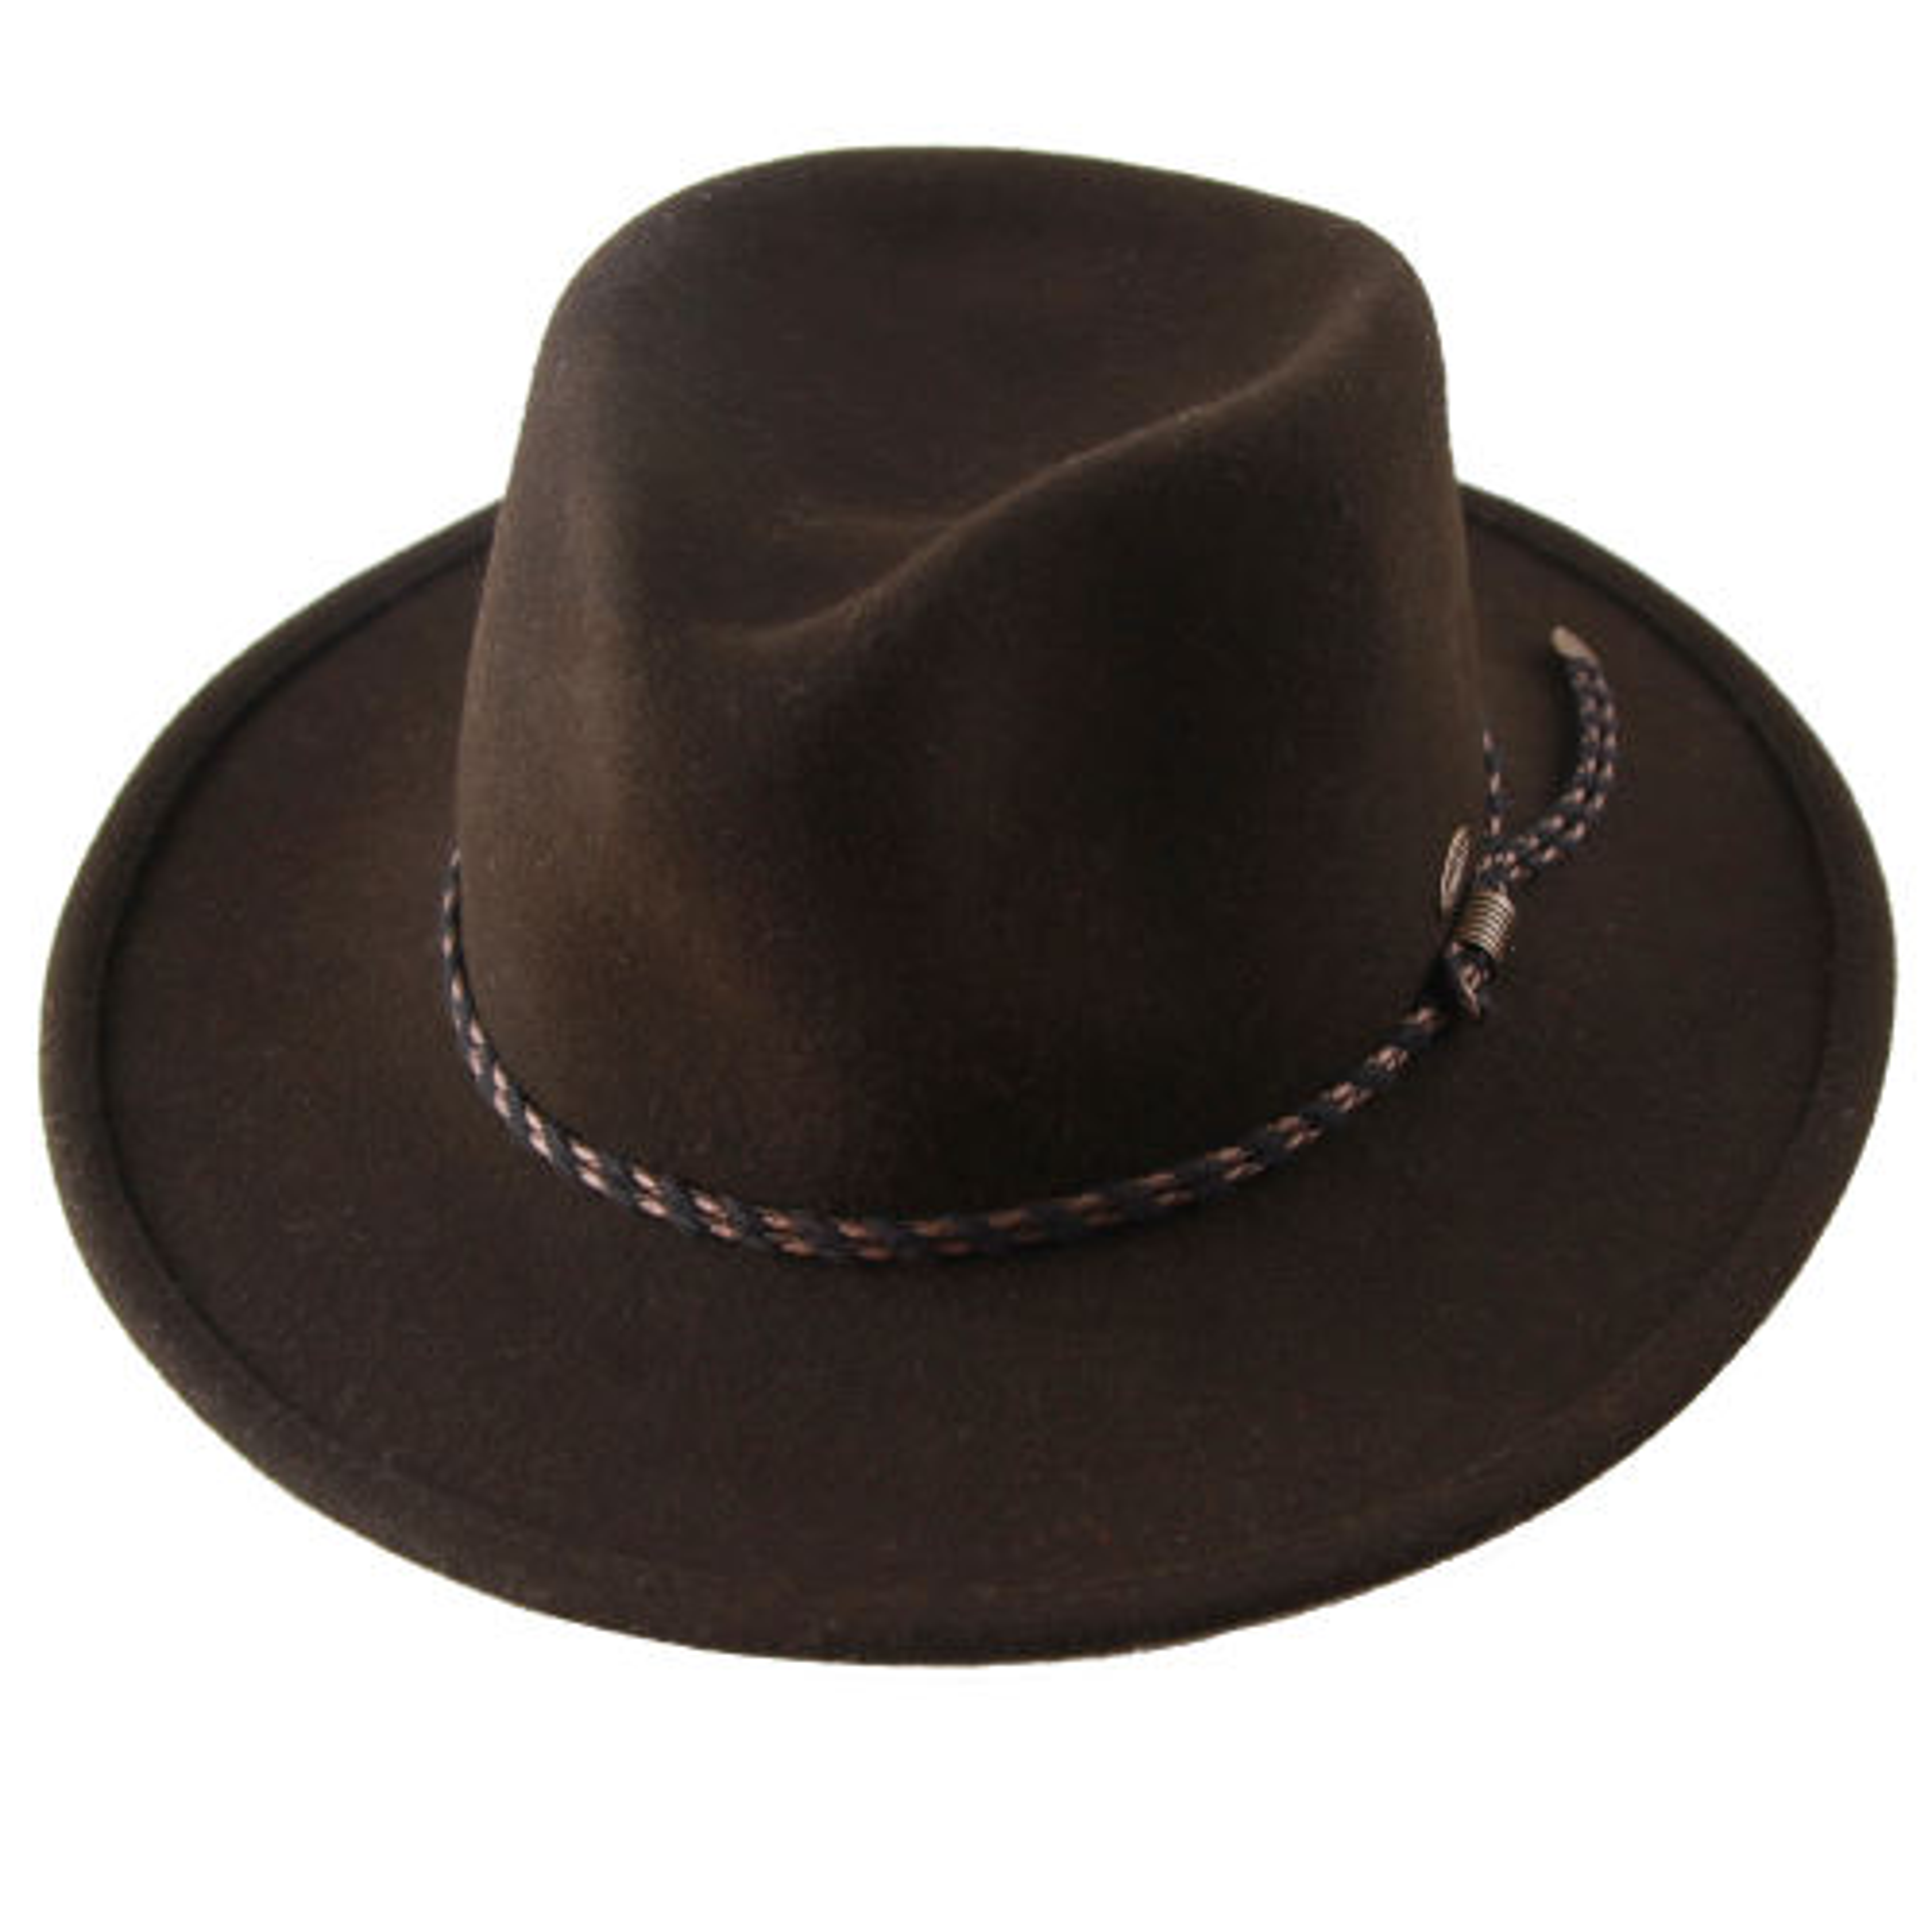 کلاه شاپو مردانه مایزر کد MA-7